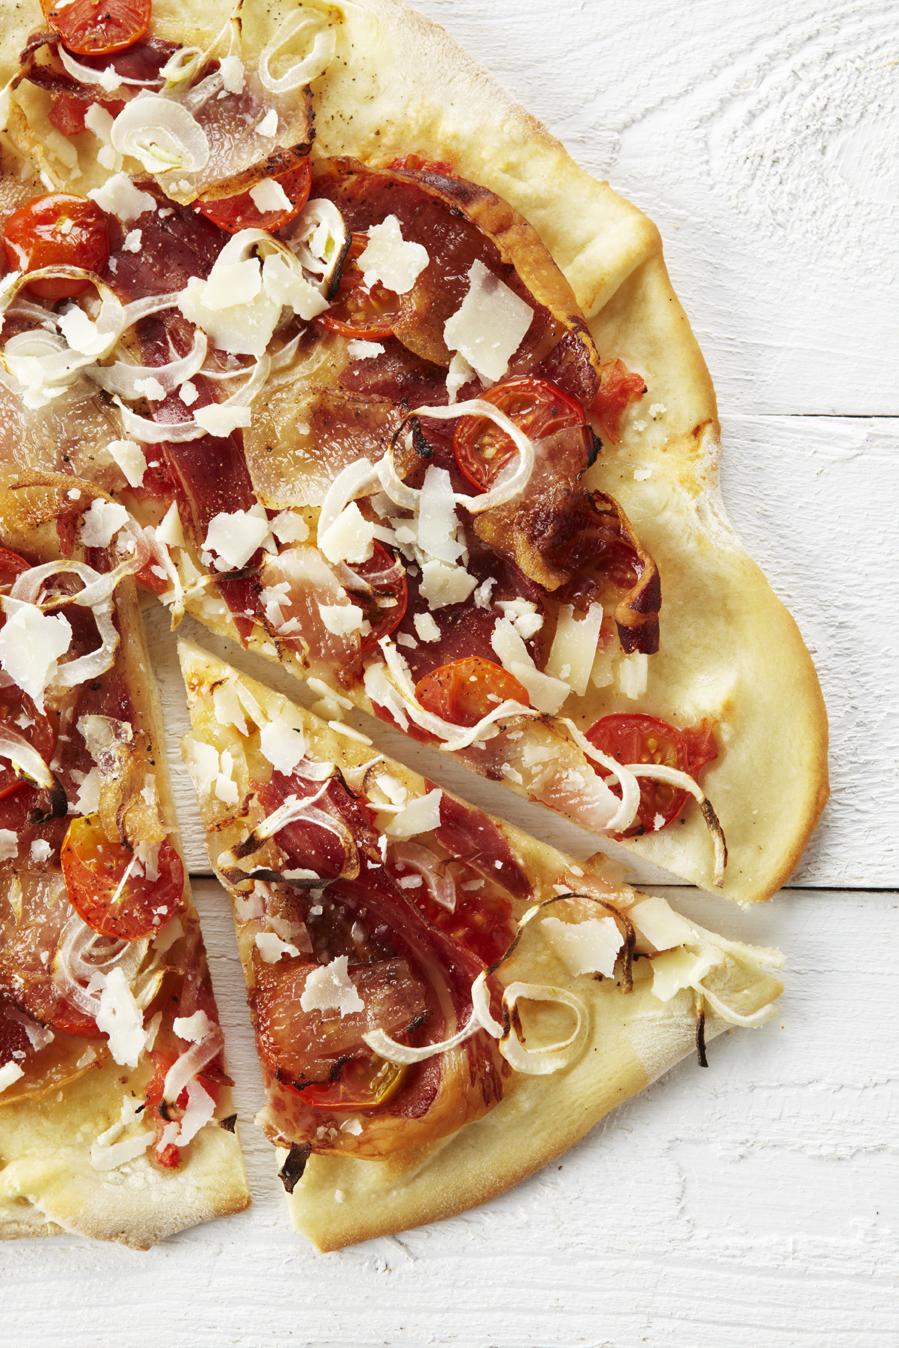 pizza5_ 49026.jpg